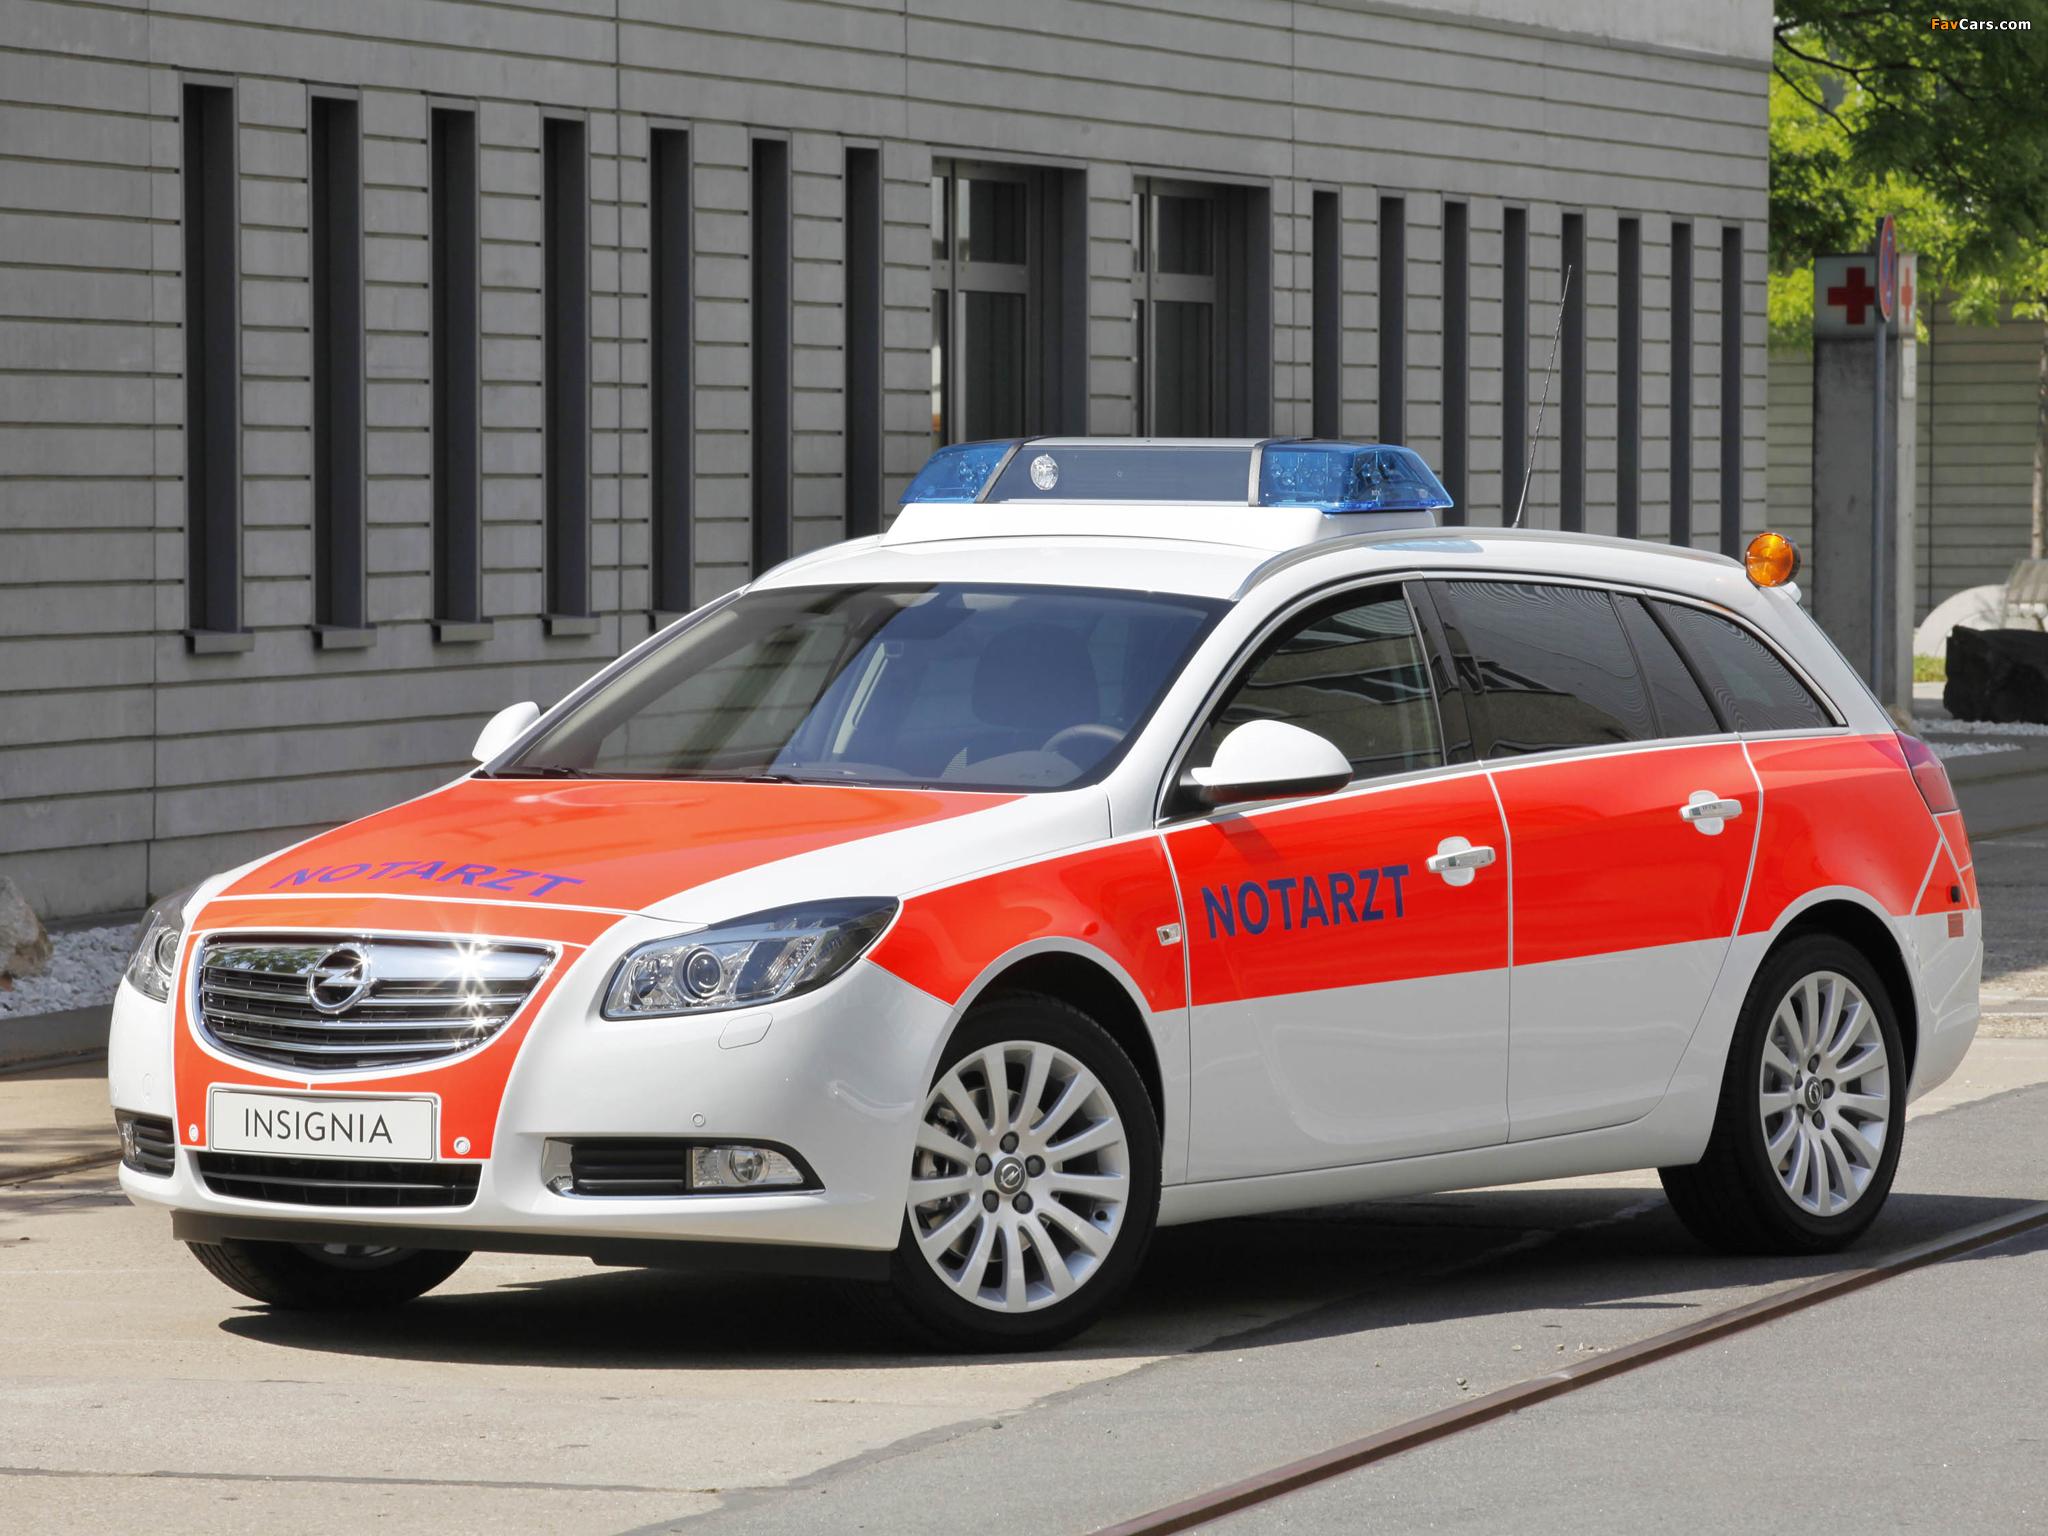 Opel Insignia Sports Tourer Notarzt 2011–13 photos (2048 x 1536)